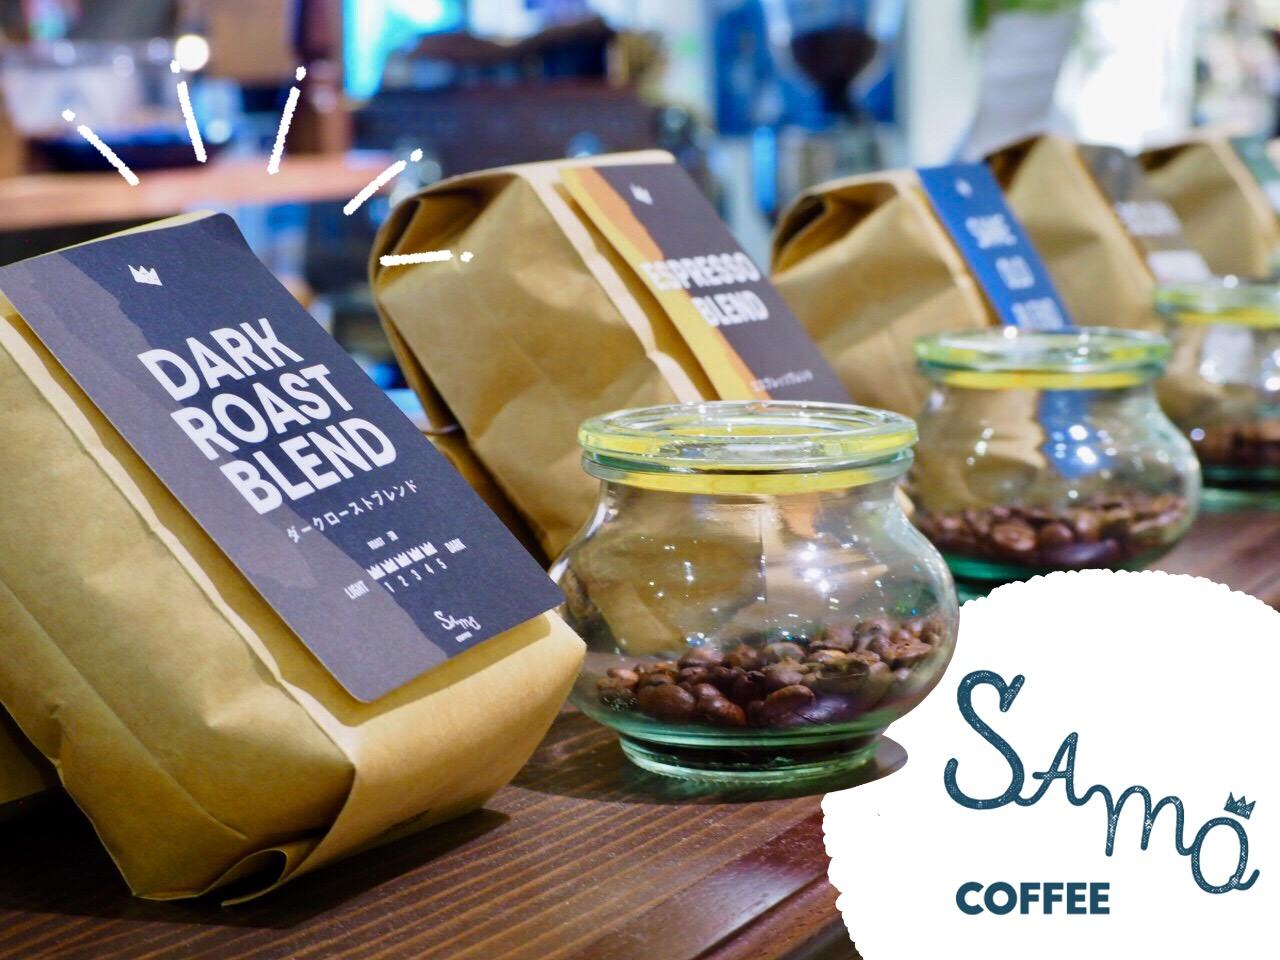 SAMO COFFEE